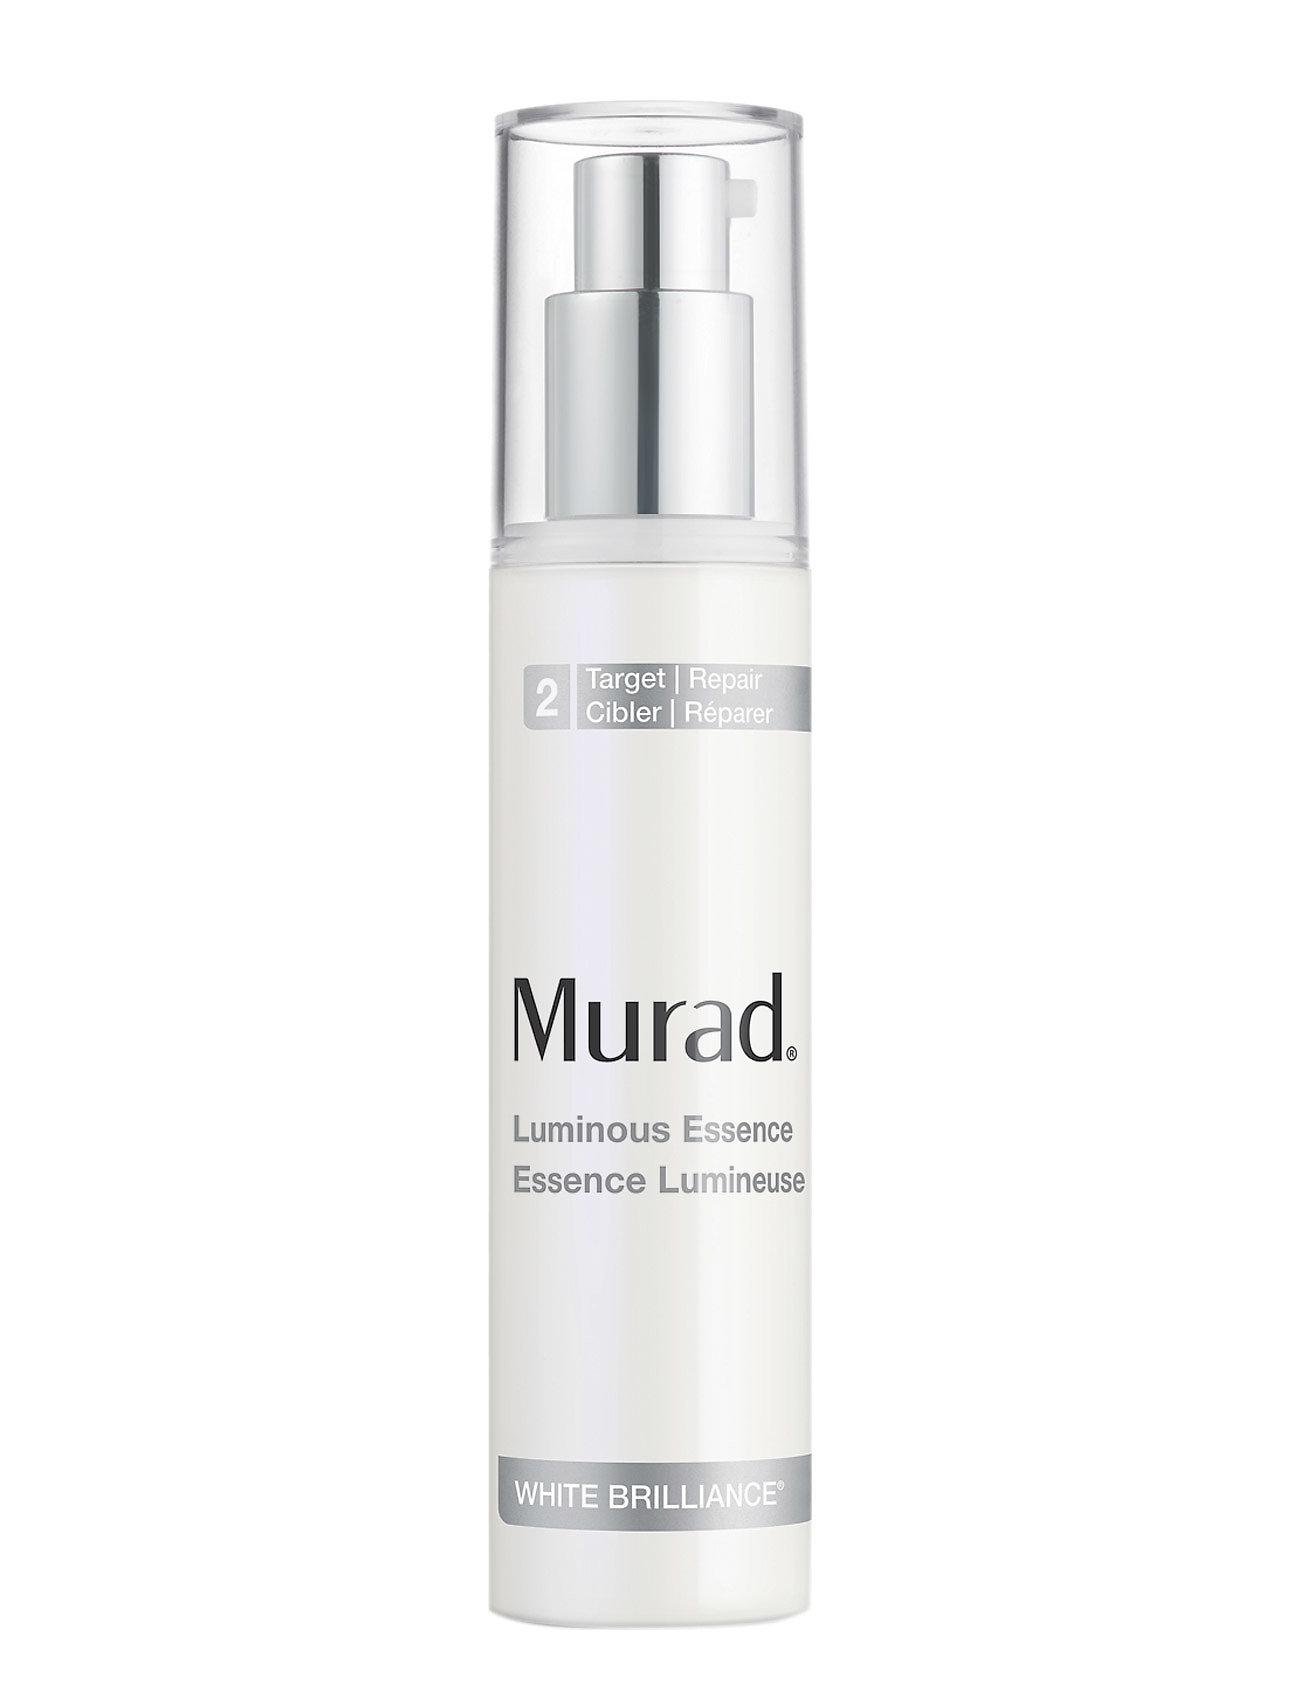 Image of Murad White Brilliance Luminous Essence Serum Ansigtspleje Nude Murad (2604352275)